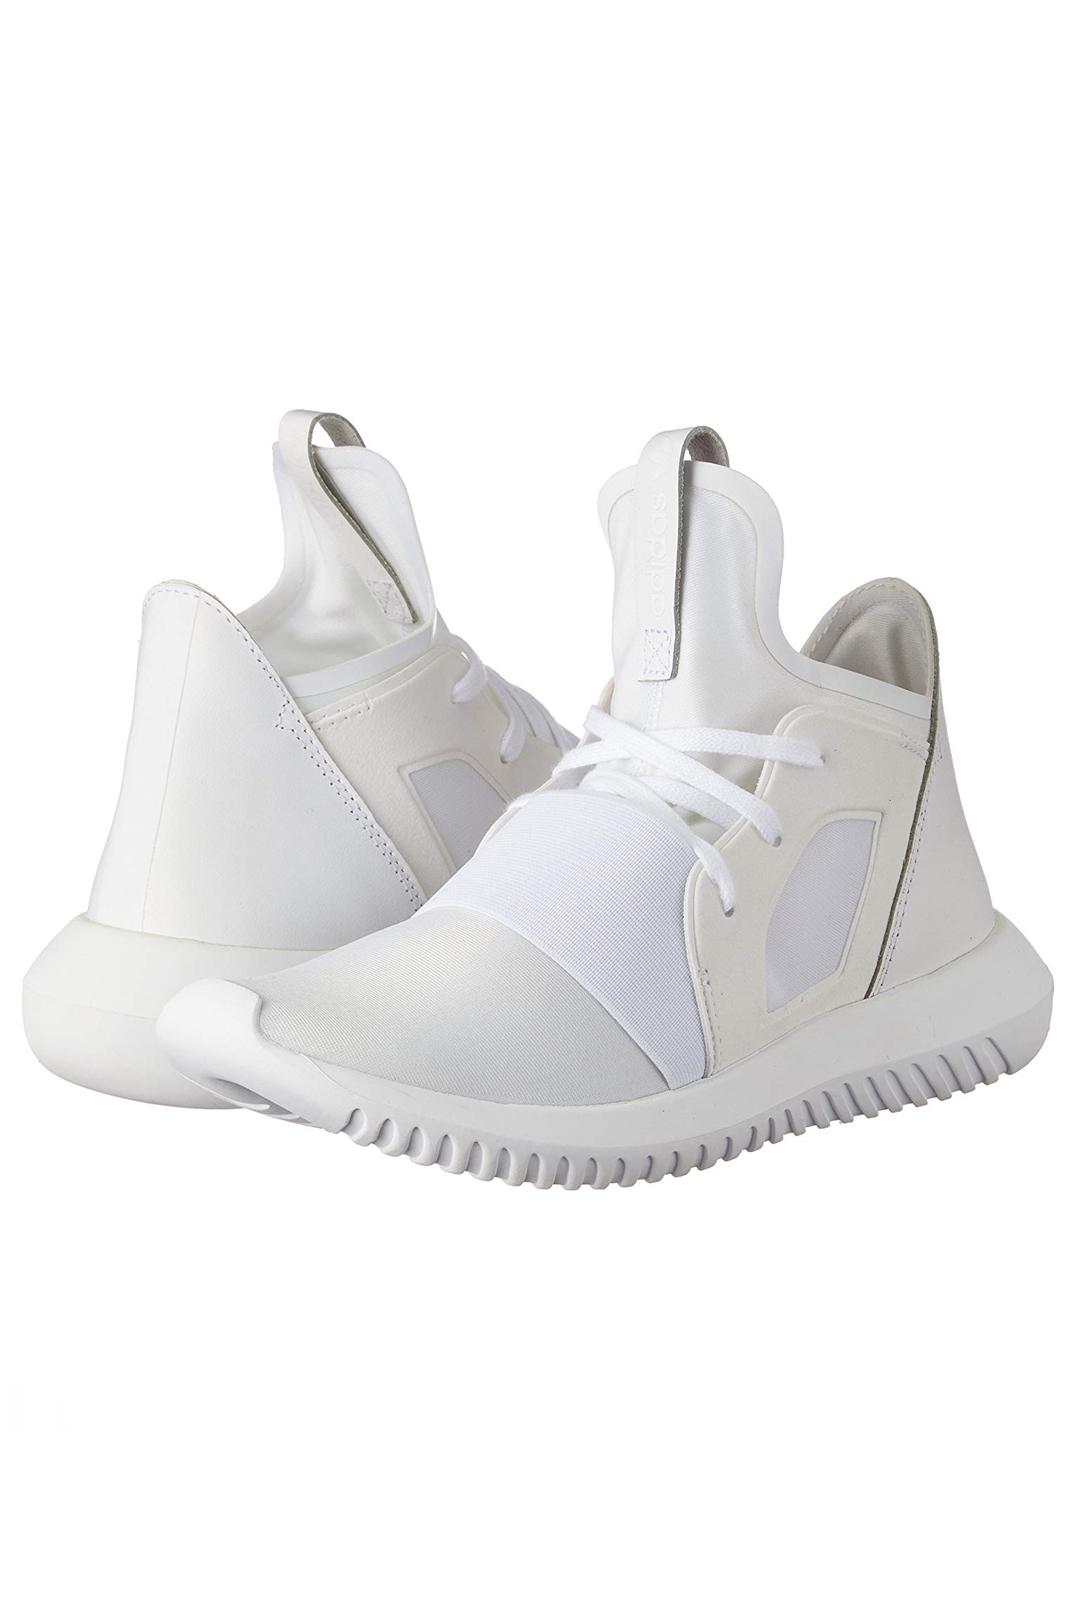 Baskets / Sneakers  Adidas S75250 TUBULAR DEFIANT W BLANC